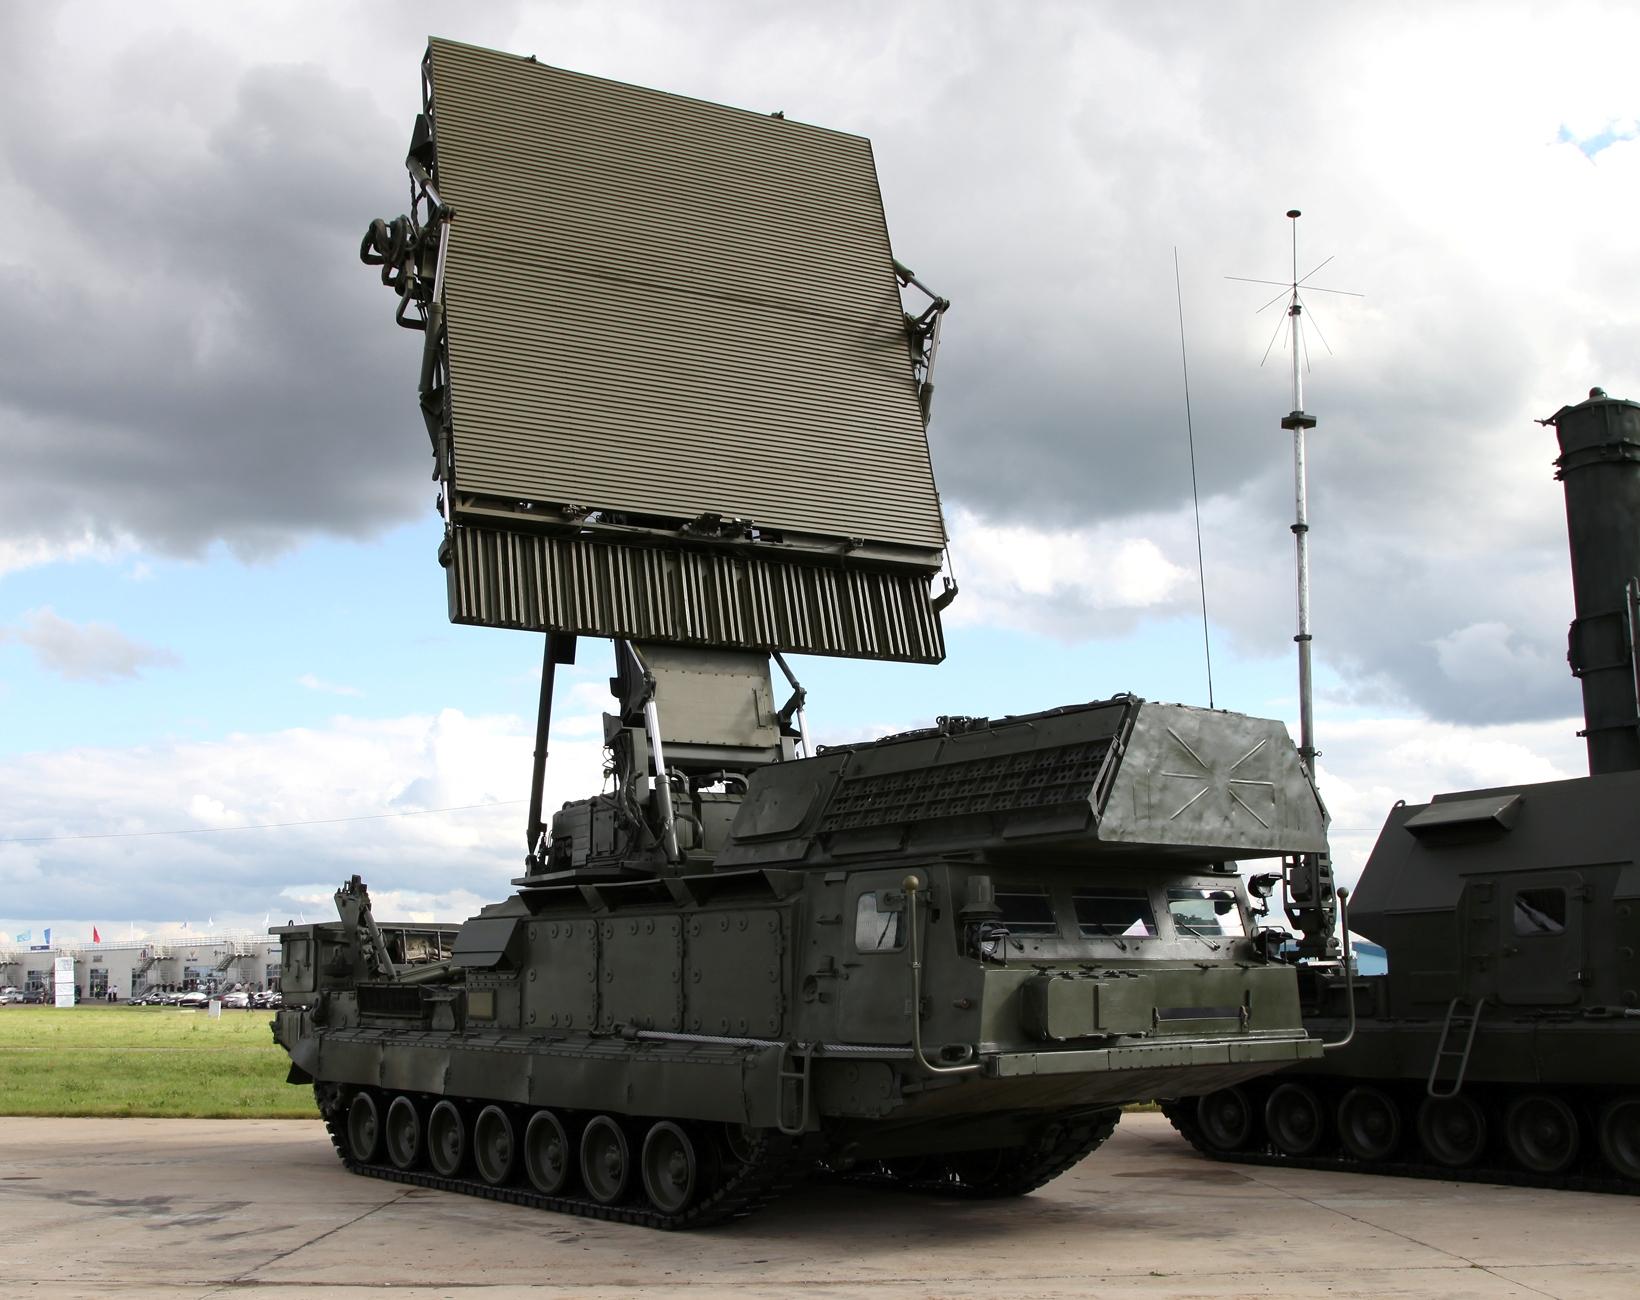 موسوعه الرادارت الروسيه فئه  X-band / VHF-Band / L-Band / UHF Band / S-Band 9S15M-radar-S-300-air-defence-system